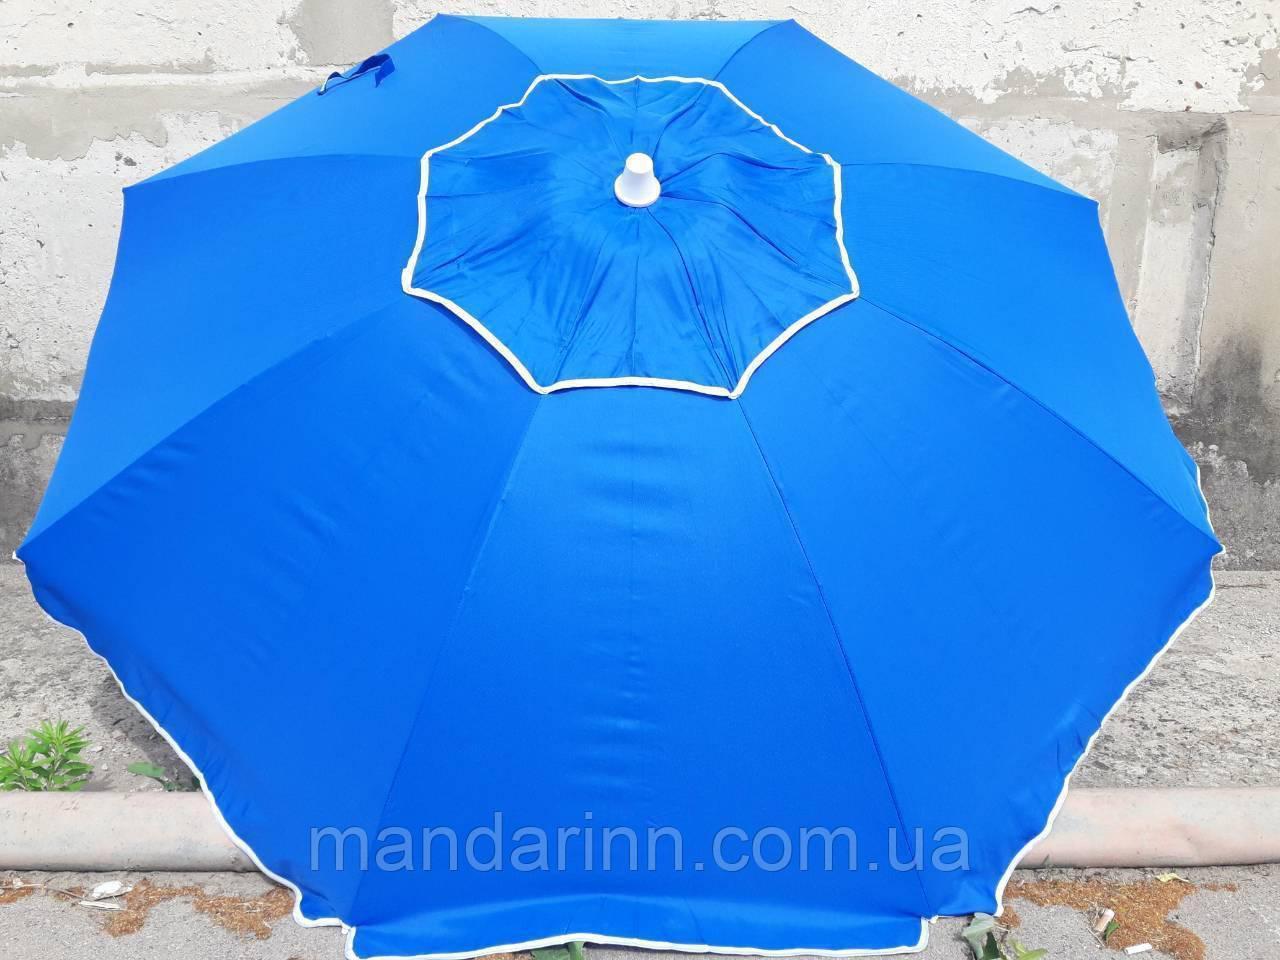 Пляжний зонт 1,8 м клапан нахил чохол червоний - фото 2